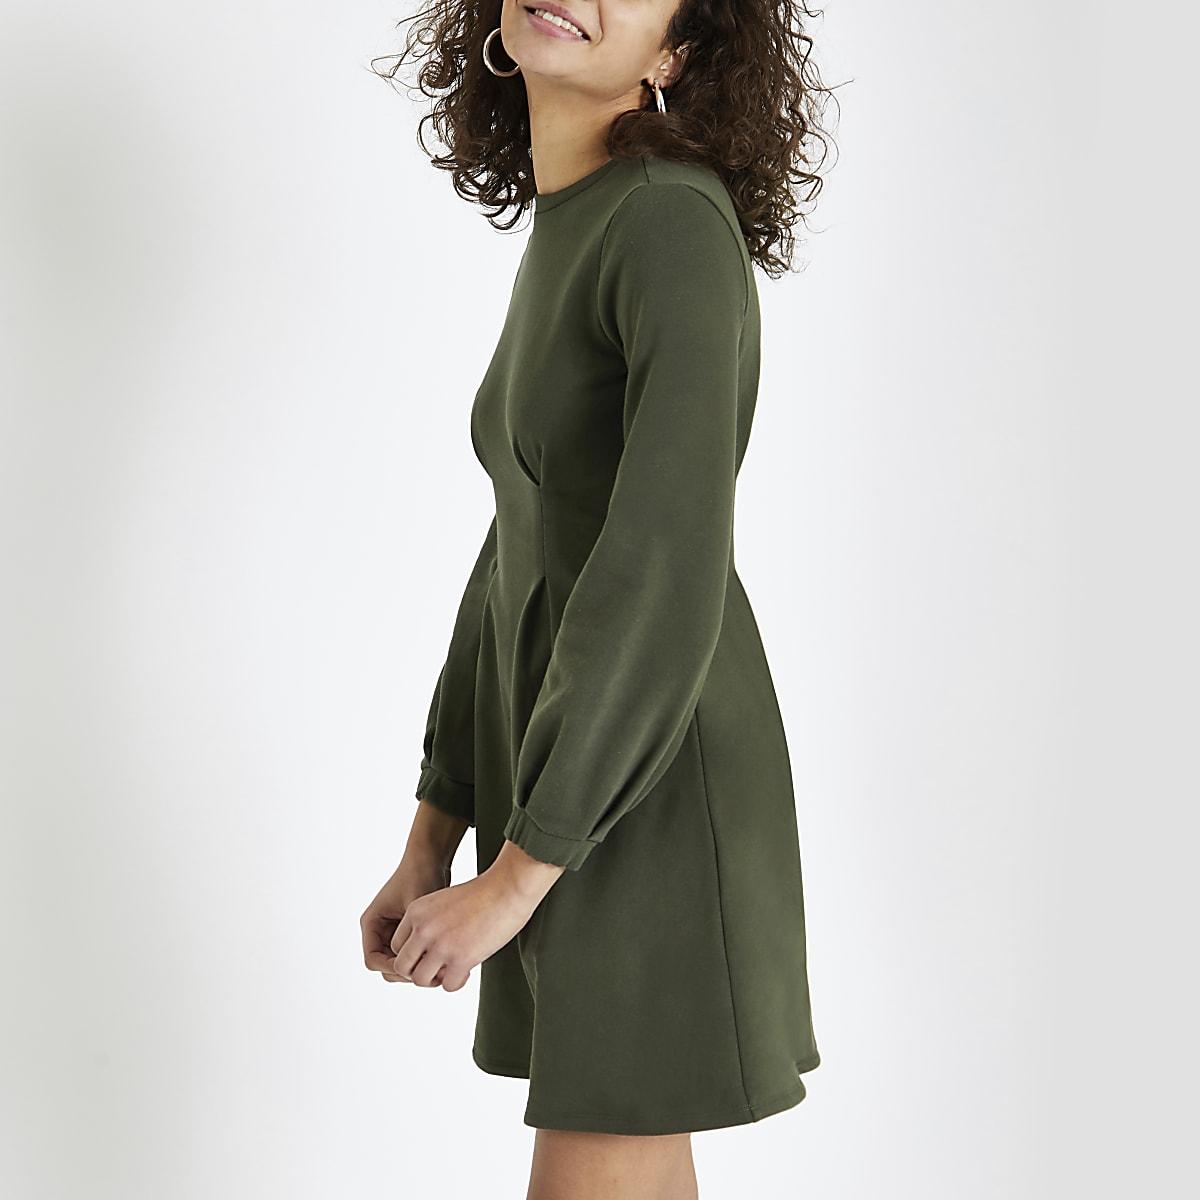 Khaki long sleeve sweater dress